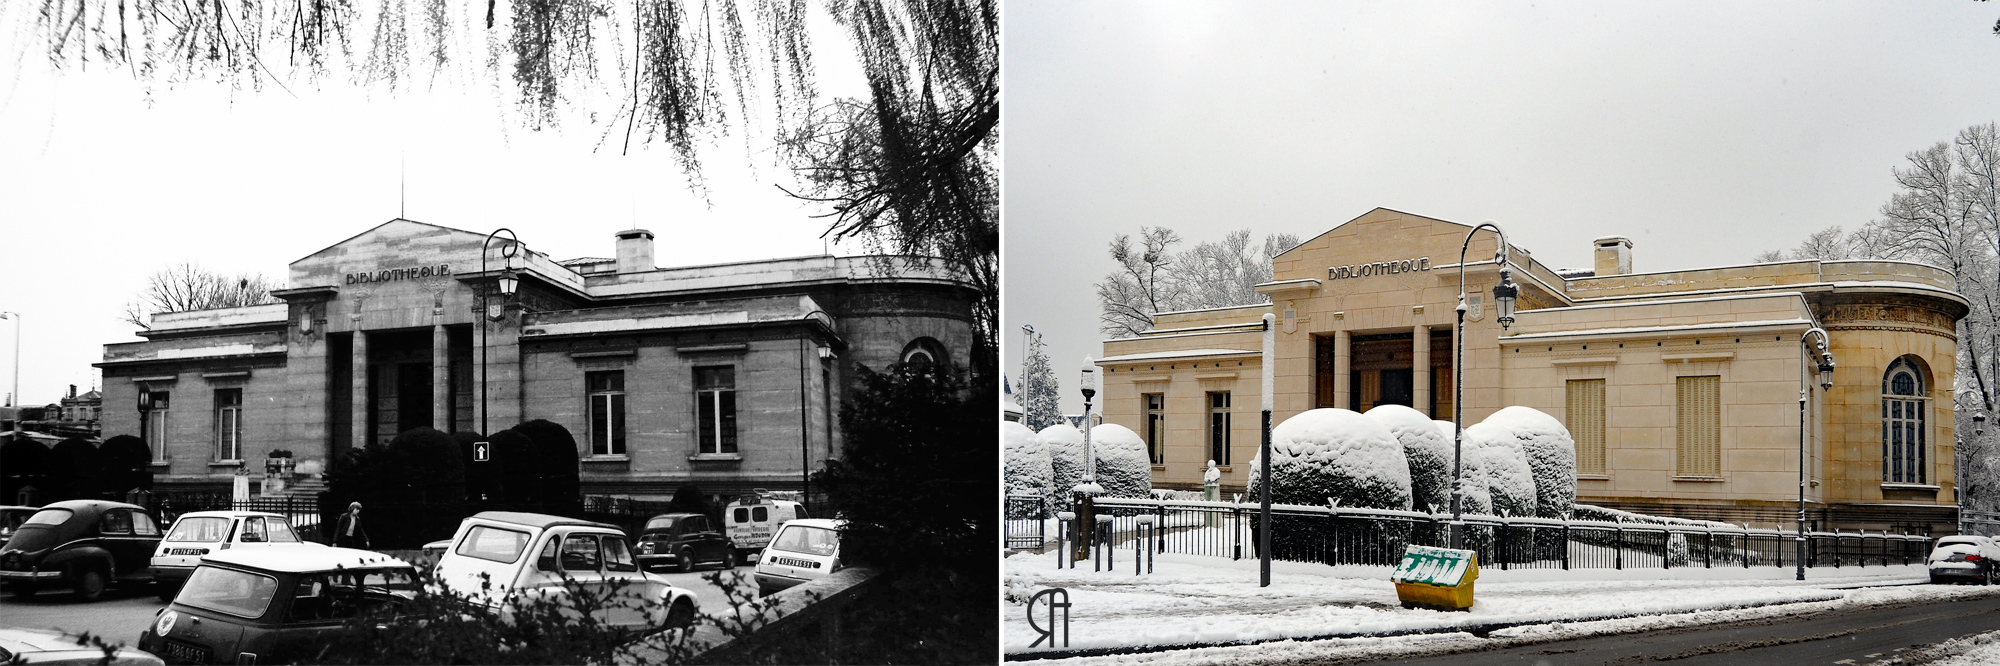 La bibliothèque Carnegie